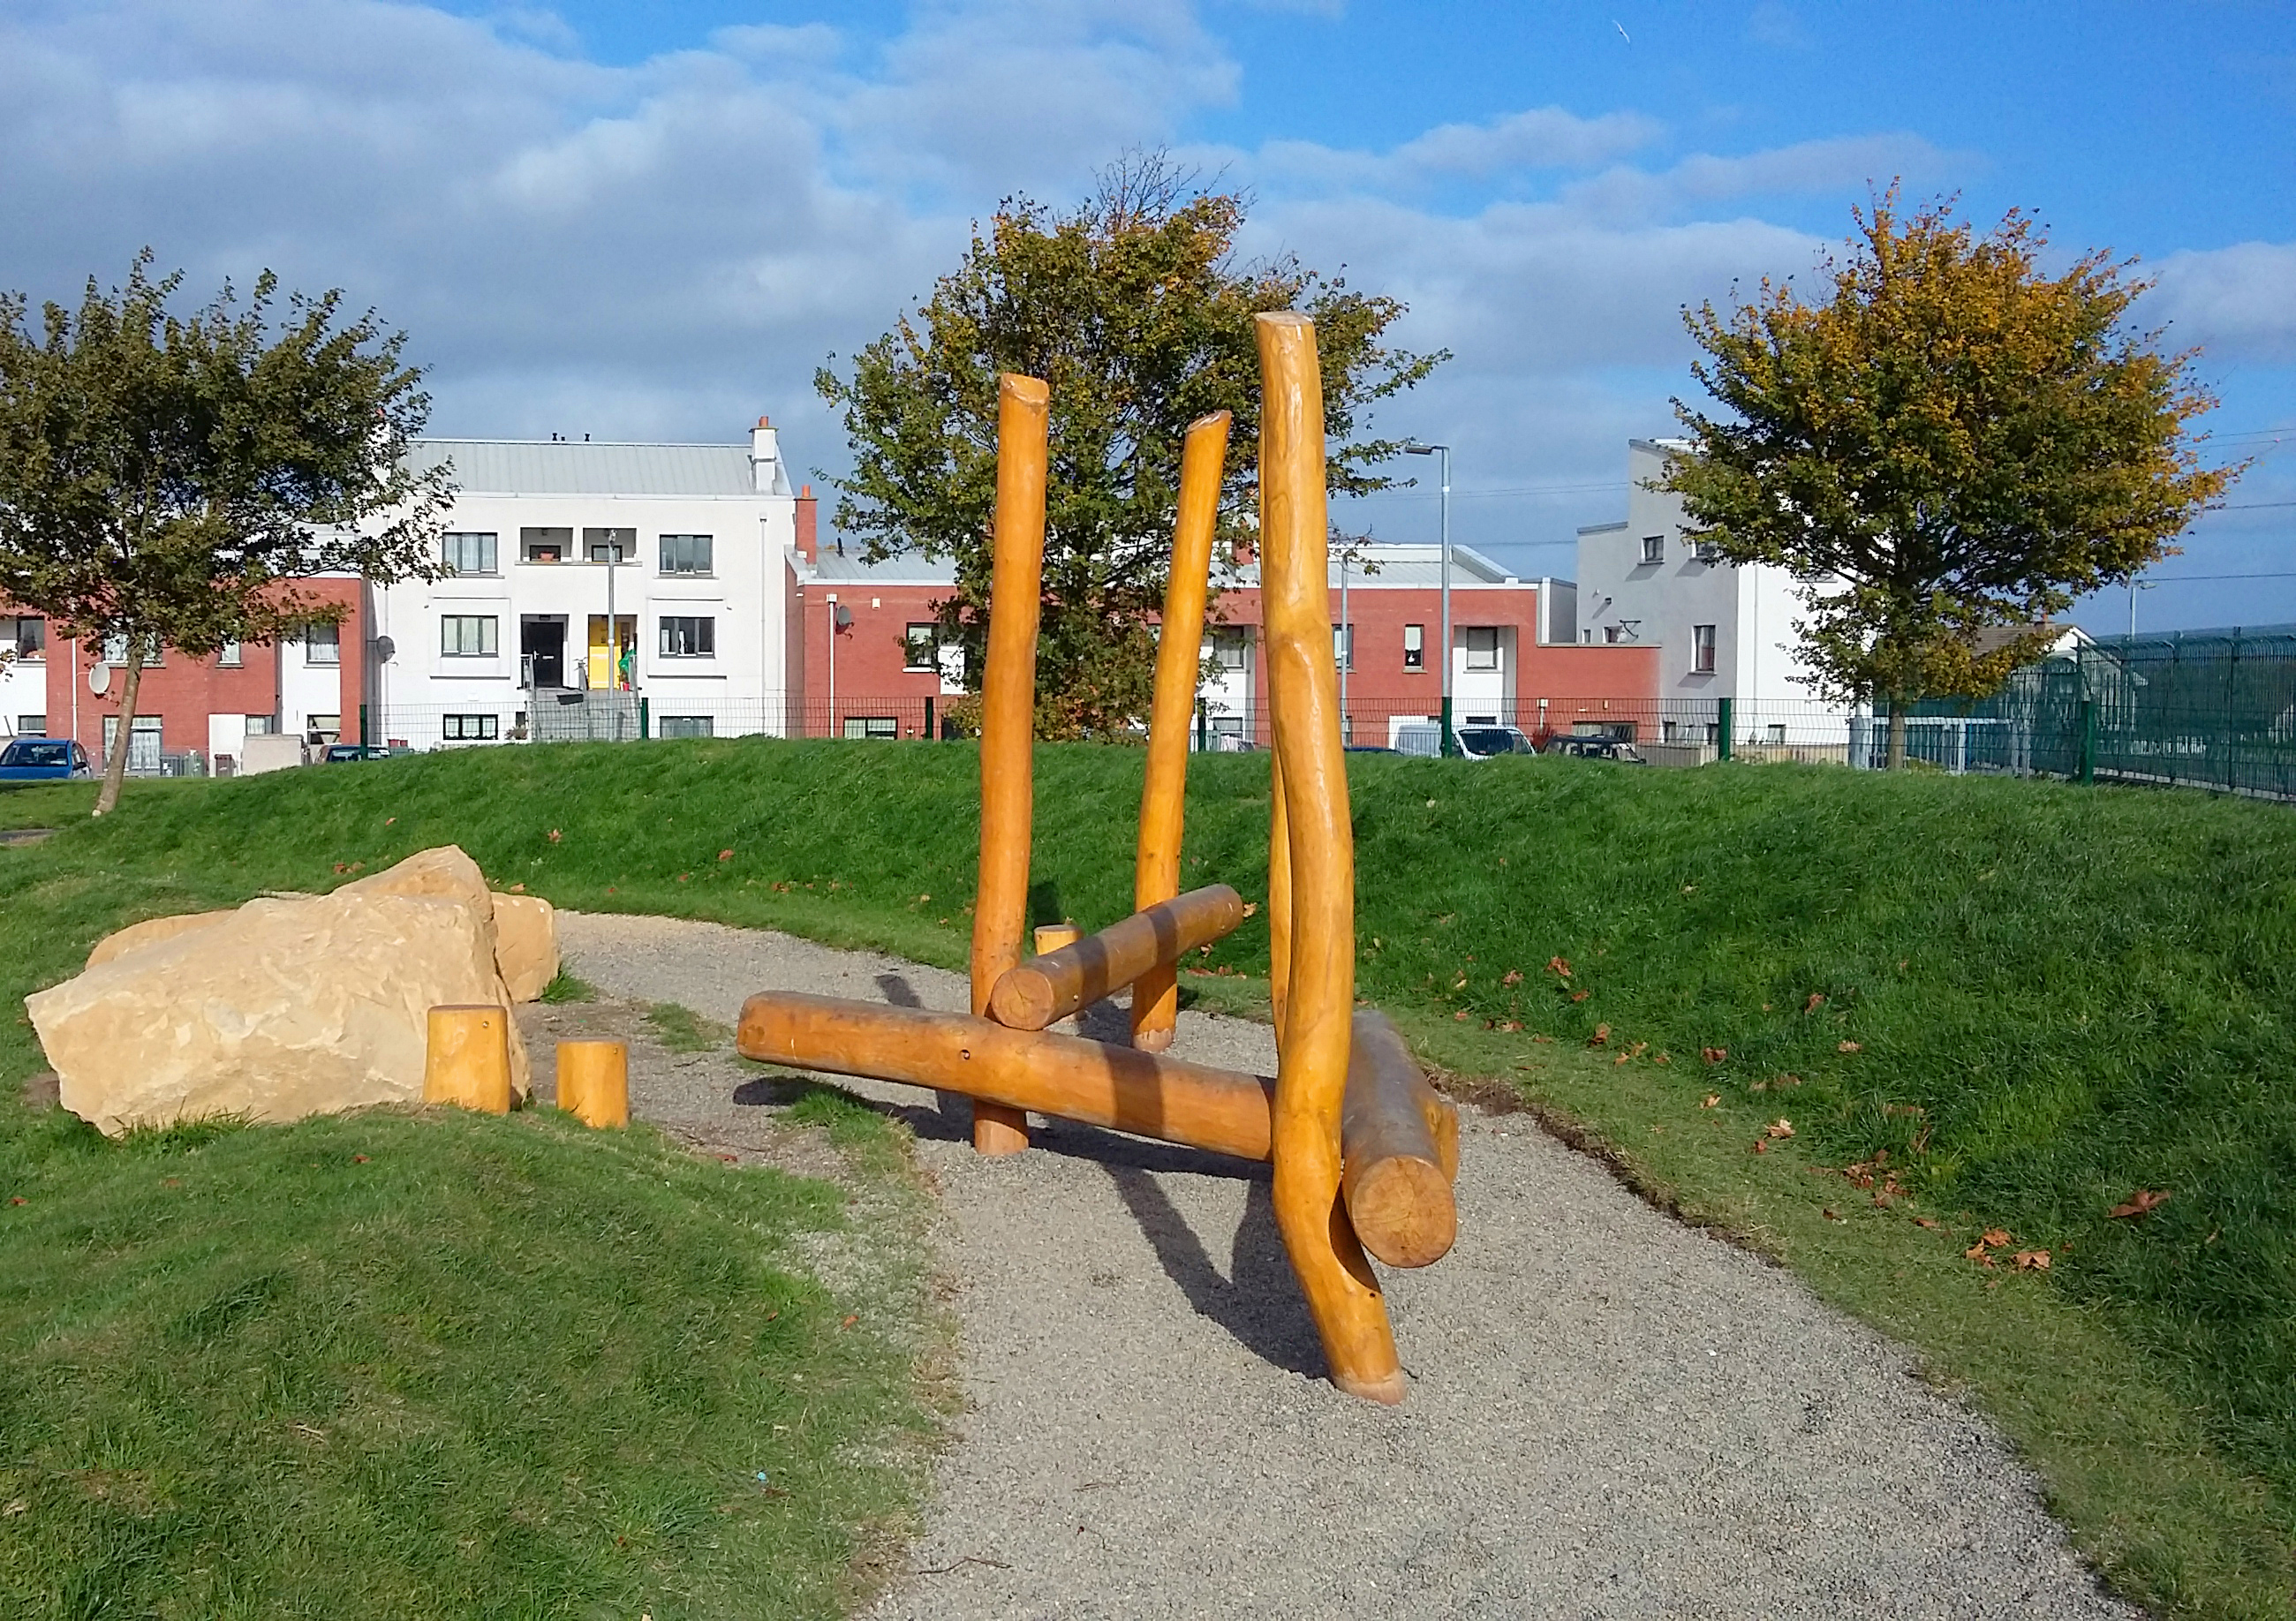 Balancing Log Walk The Children S Playground Company